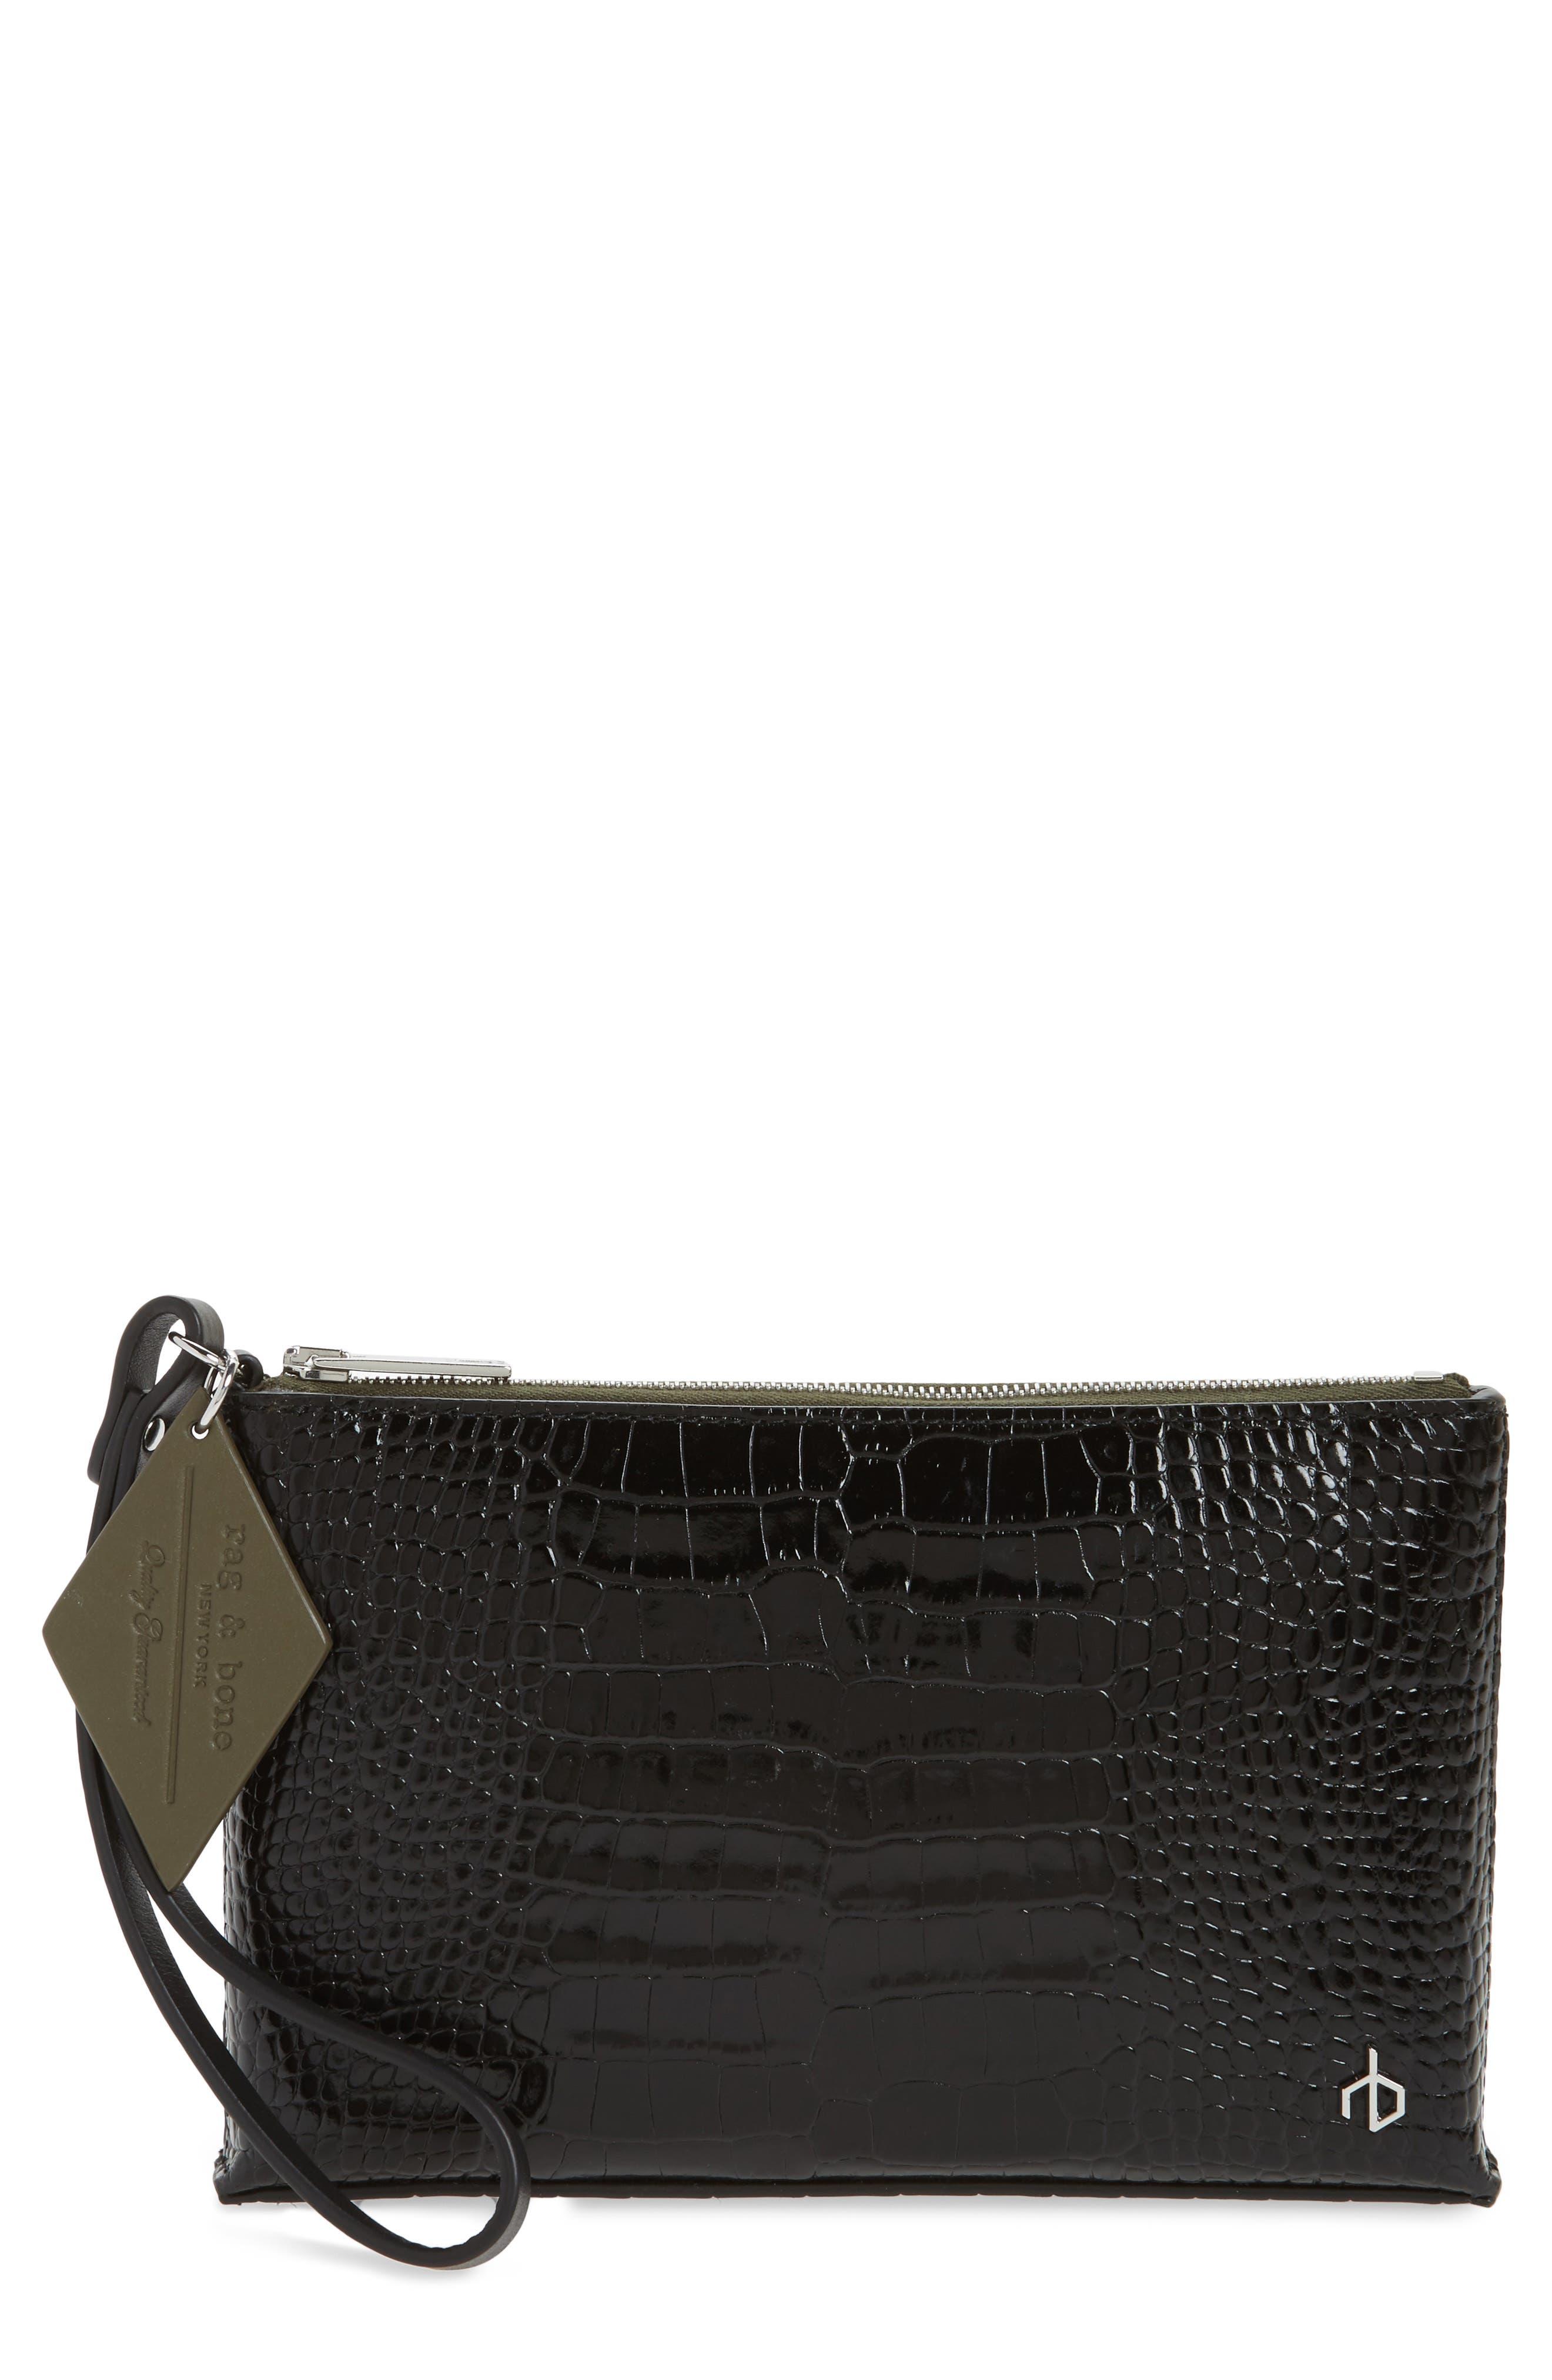 Croc Embossed Leather Wristlet,                         Main,                         color, Black Croco